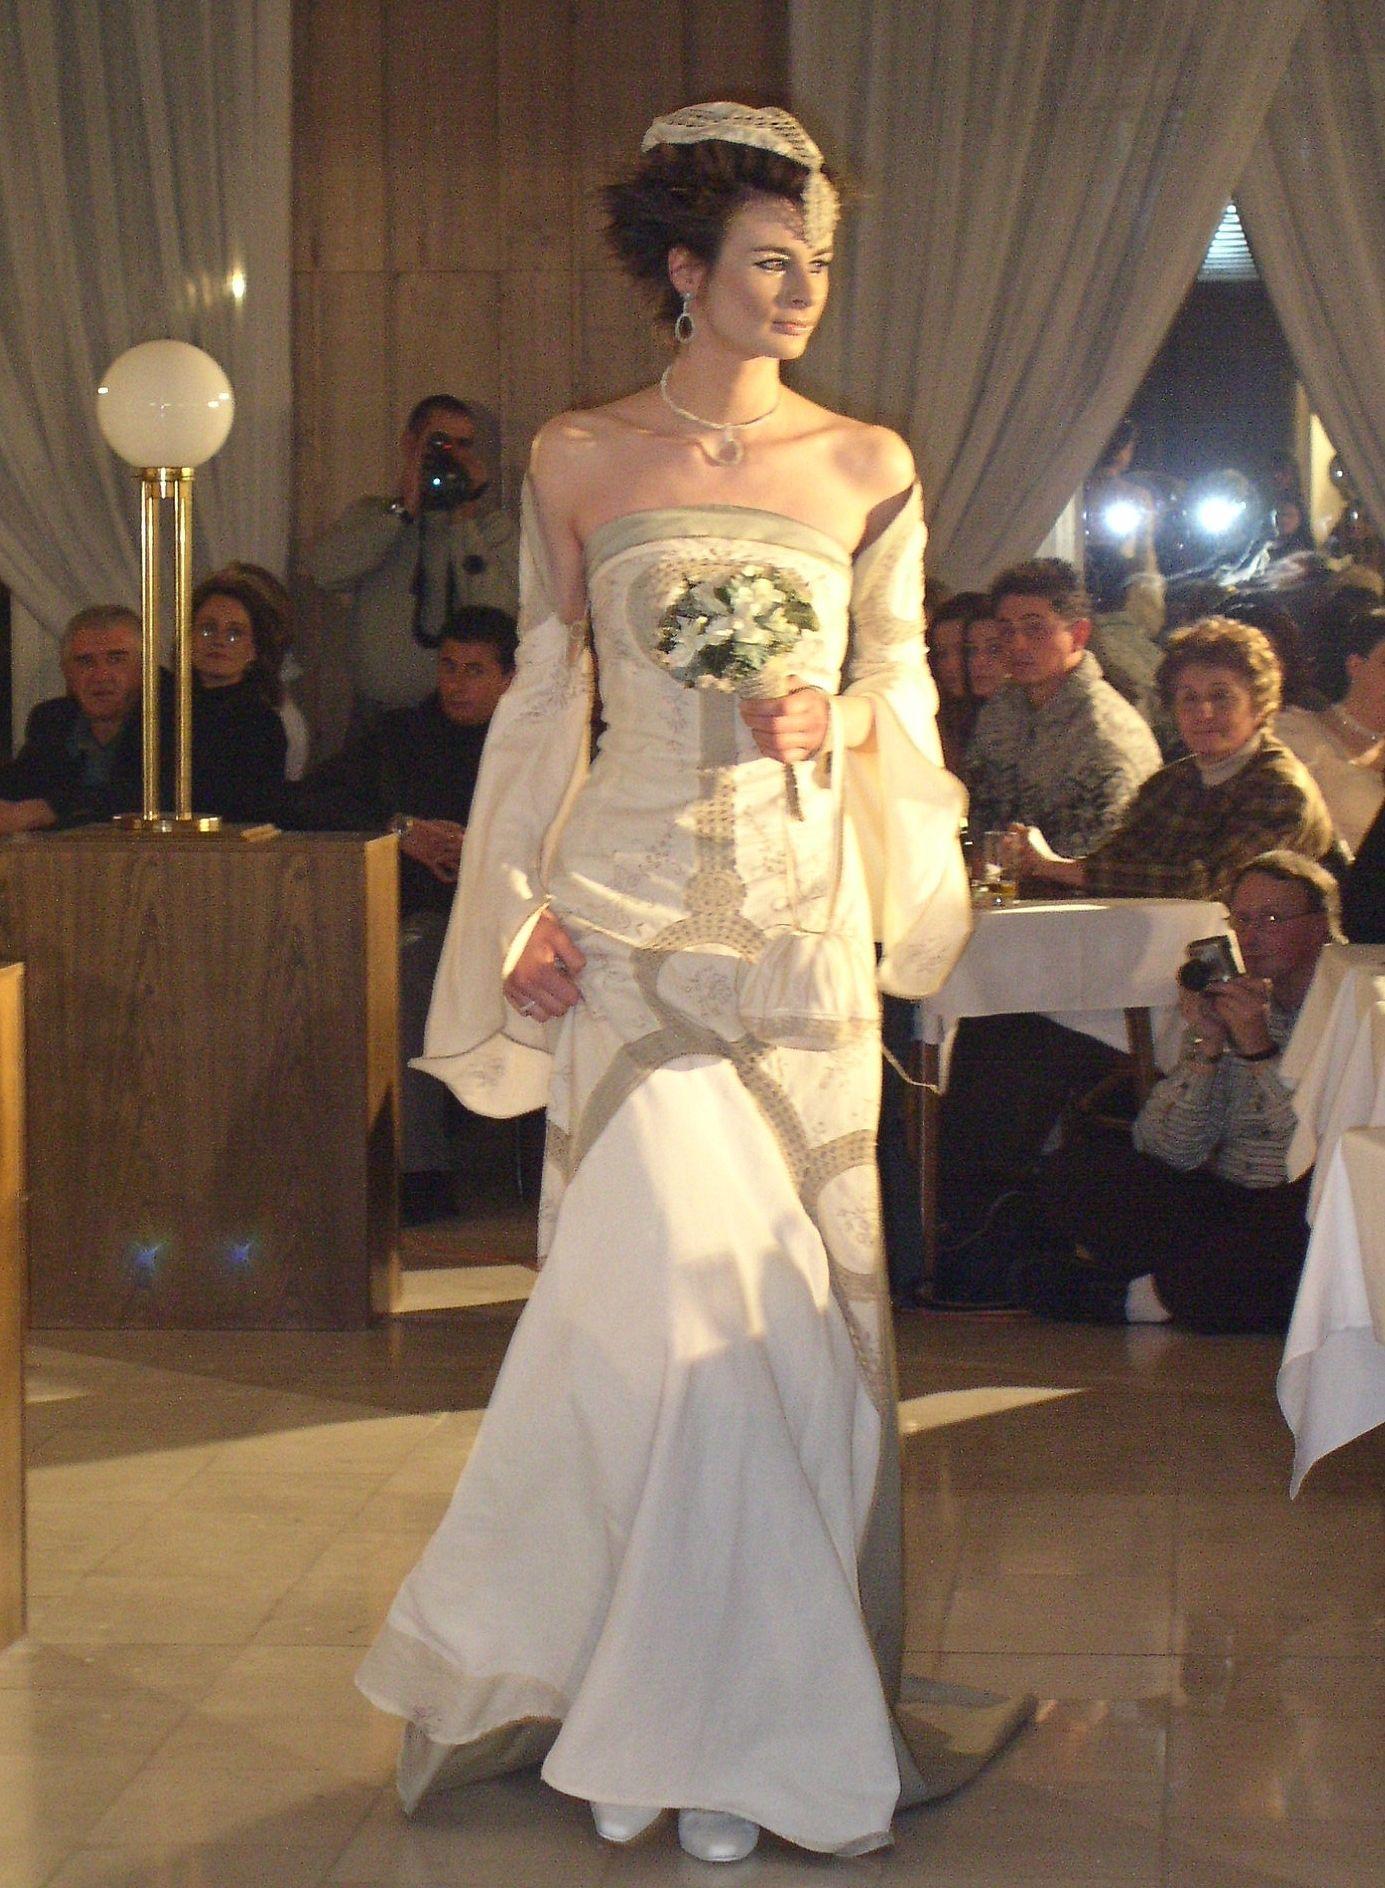 Lord Of The Rings Inspired Wedding Dress   Wedding Dress   Pinterest ...